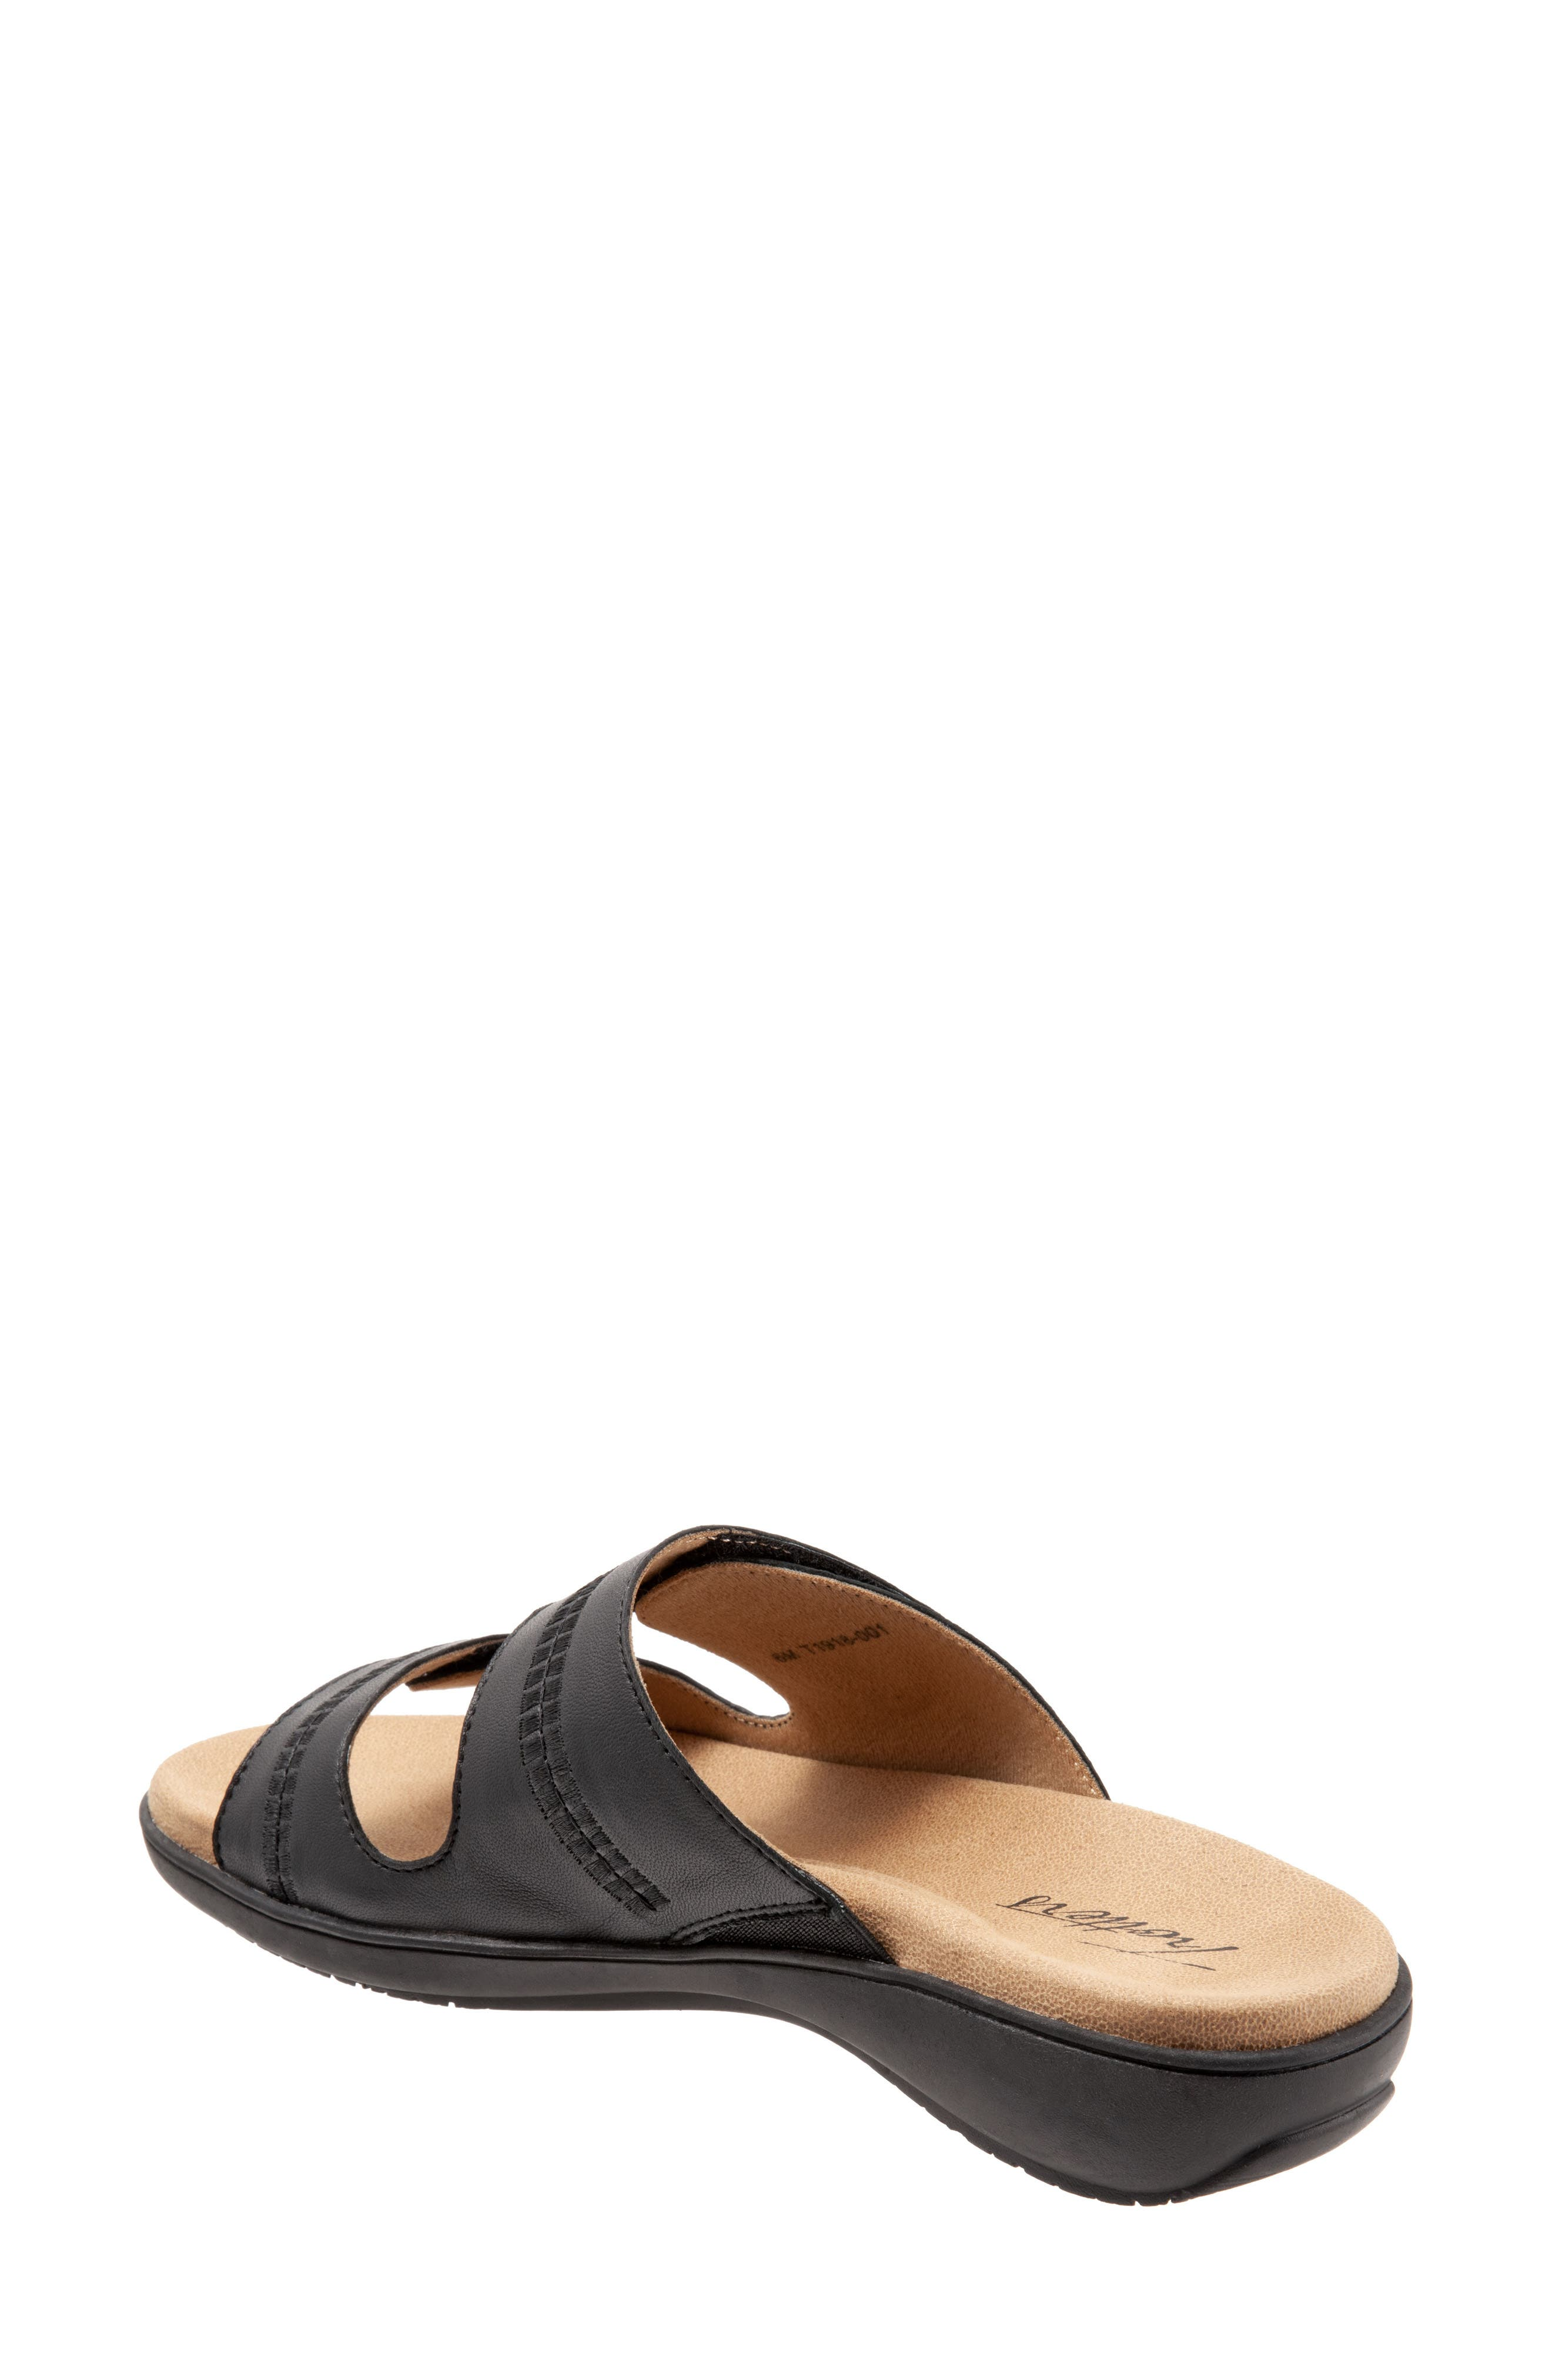 Vale Double Strap Slide Sandal,                             Alternate thumbnail 2, color,                             BLACK LEATHER